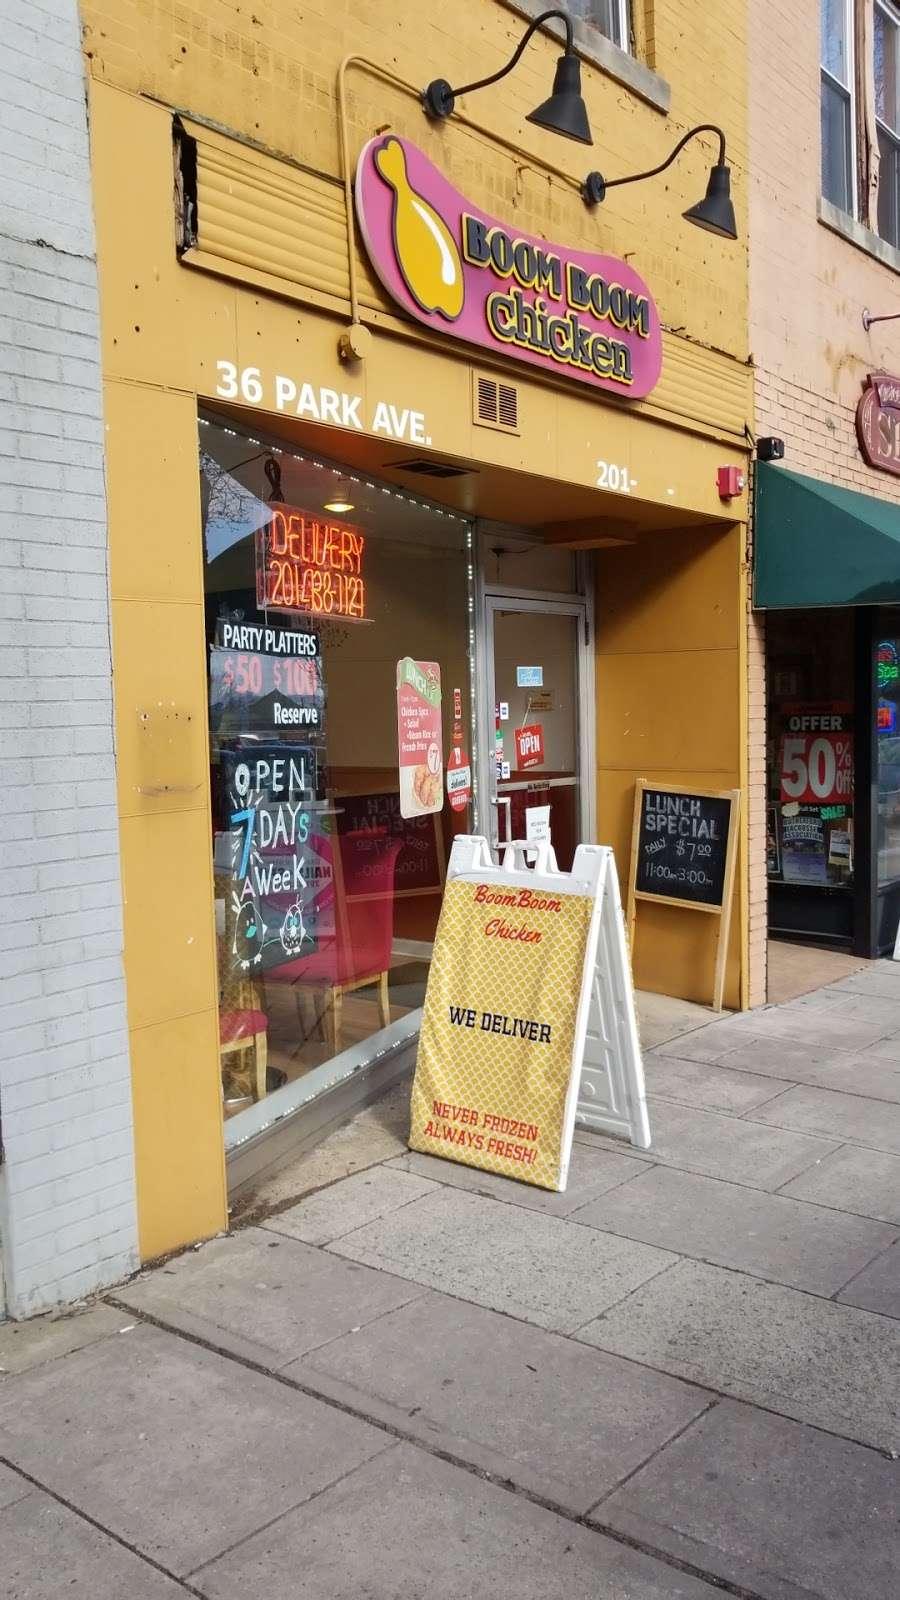 Boom Boom Chicken - restaurant  | Photo 3 of 10 | Address: 36 Park Ave, Rutherford, NJ 07070, USA | Phone: (201) 438-1124